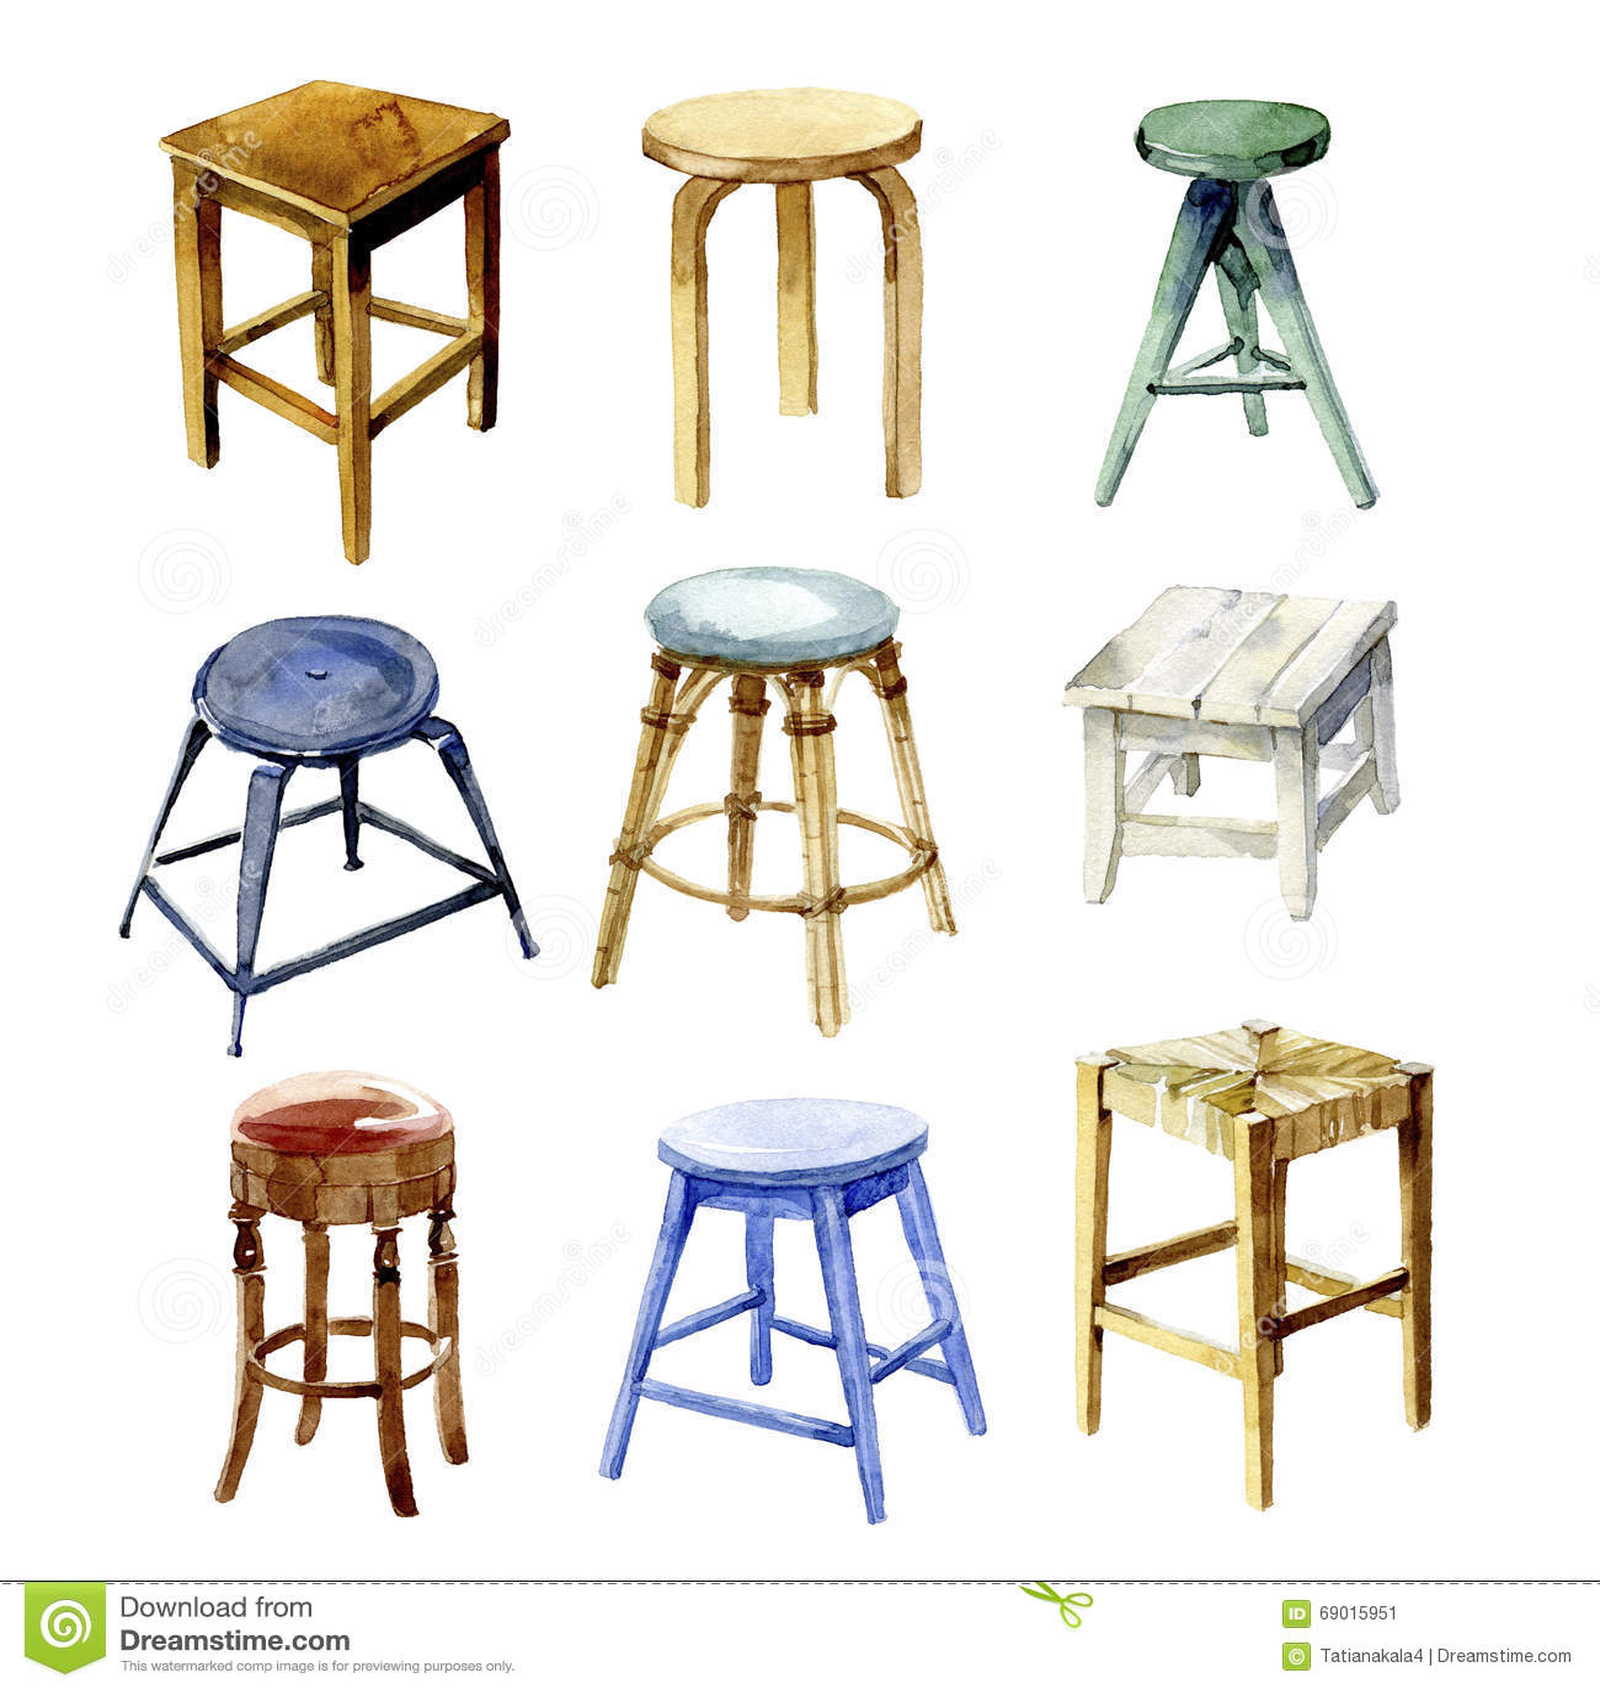 kitchen stools with backs bar for island 拉长的家具现有量例证集合白色厨房露背的凳子库存例证 插画包括有家具 厨房露背的凳子额嘴装饰飞行例证图象其纸部分燕子水彩